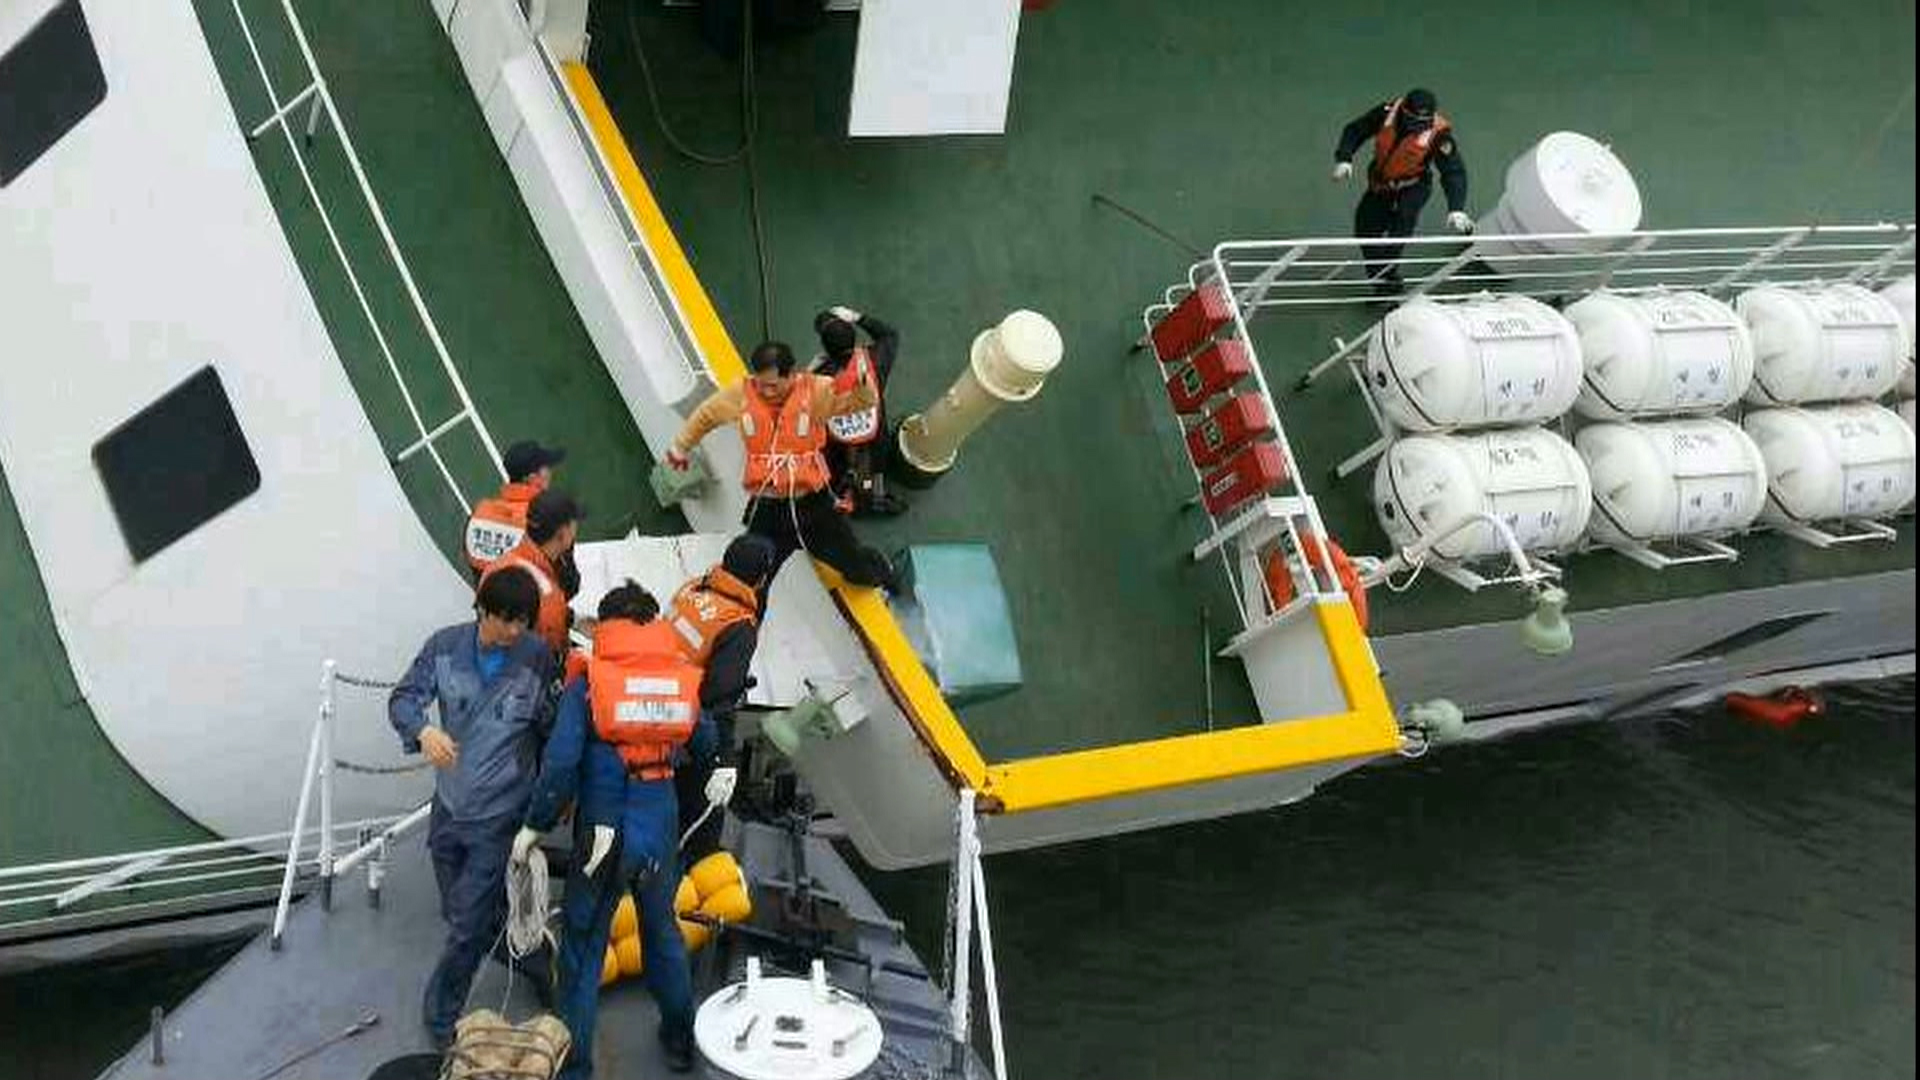 'I Am Sorry': Ferry Captain Explains Delay in Evacuation